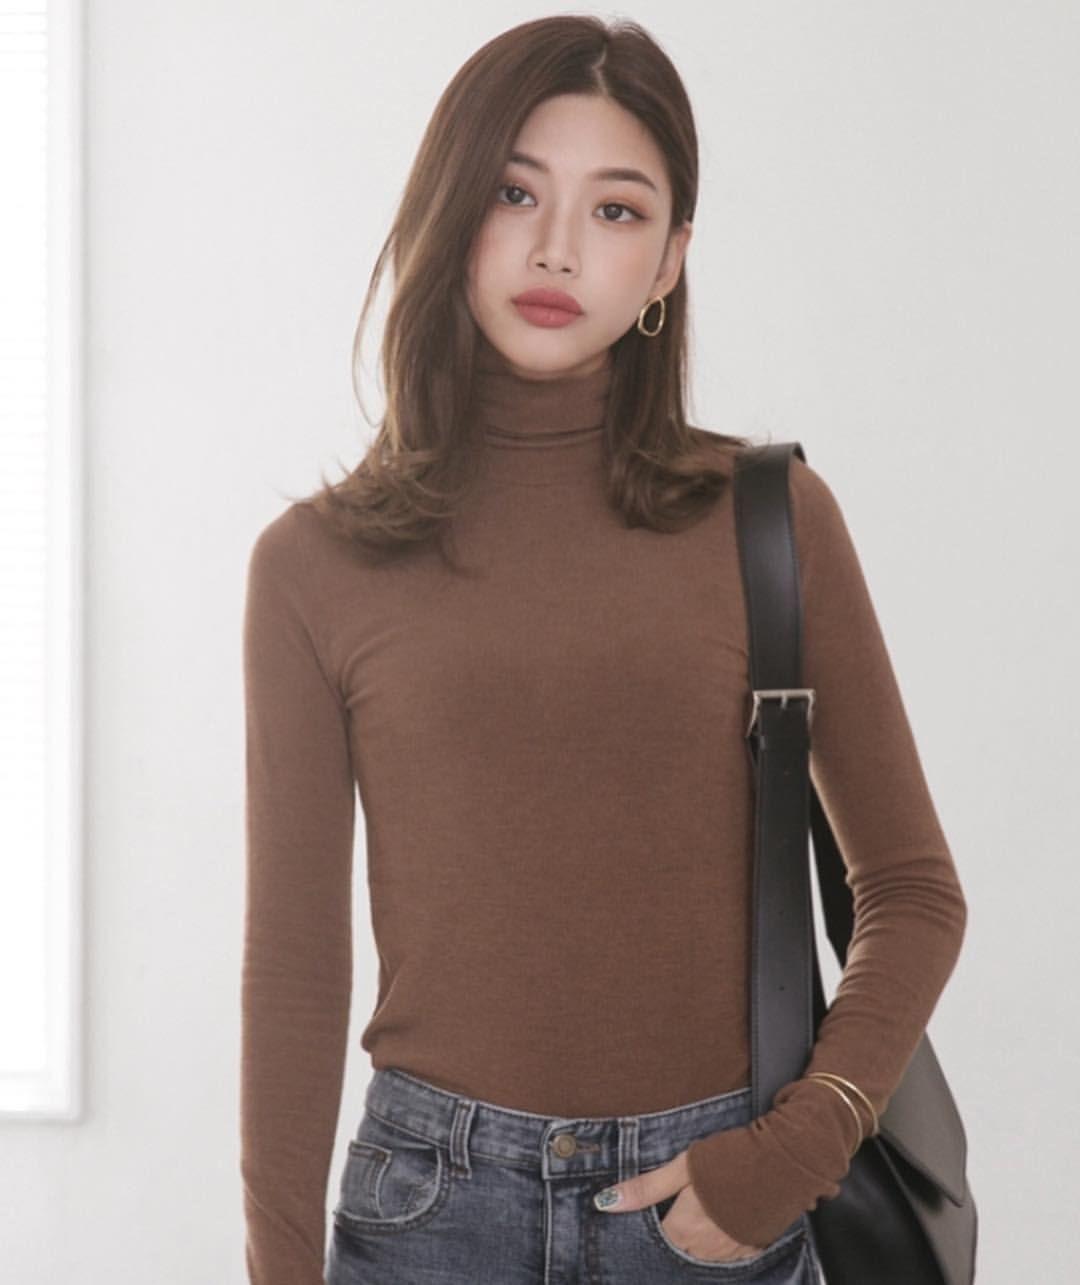 Fleece pullover   Plaid pullover, Pullover, Fleece pullover